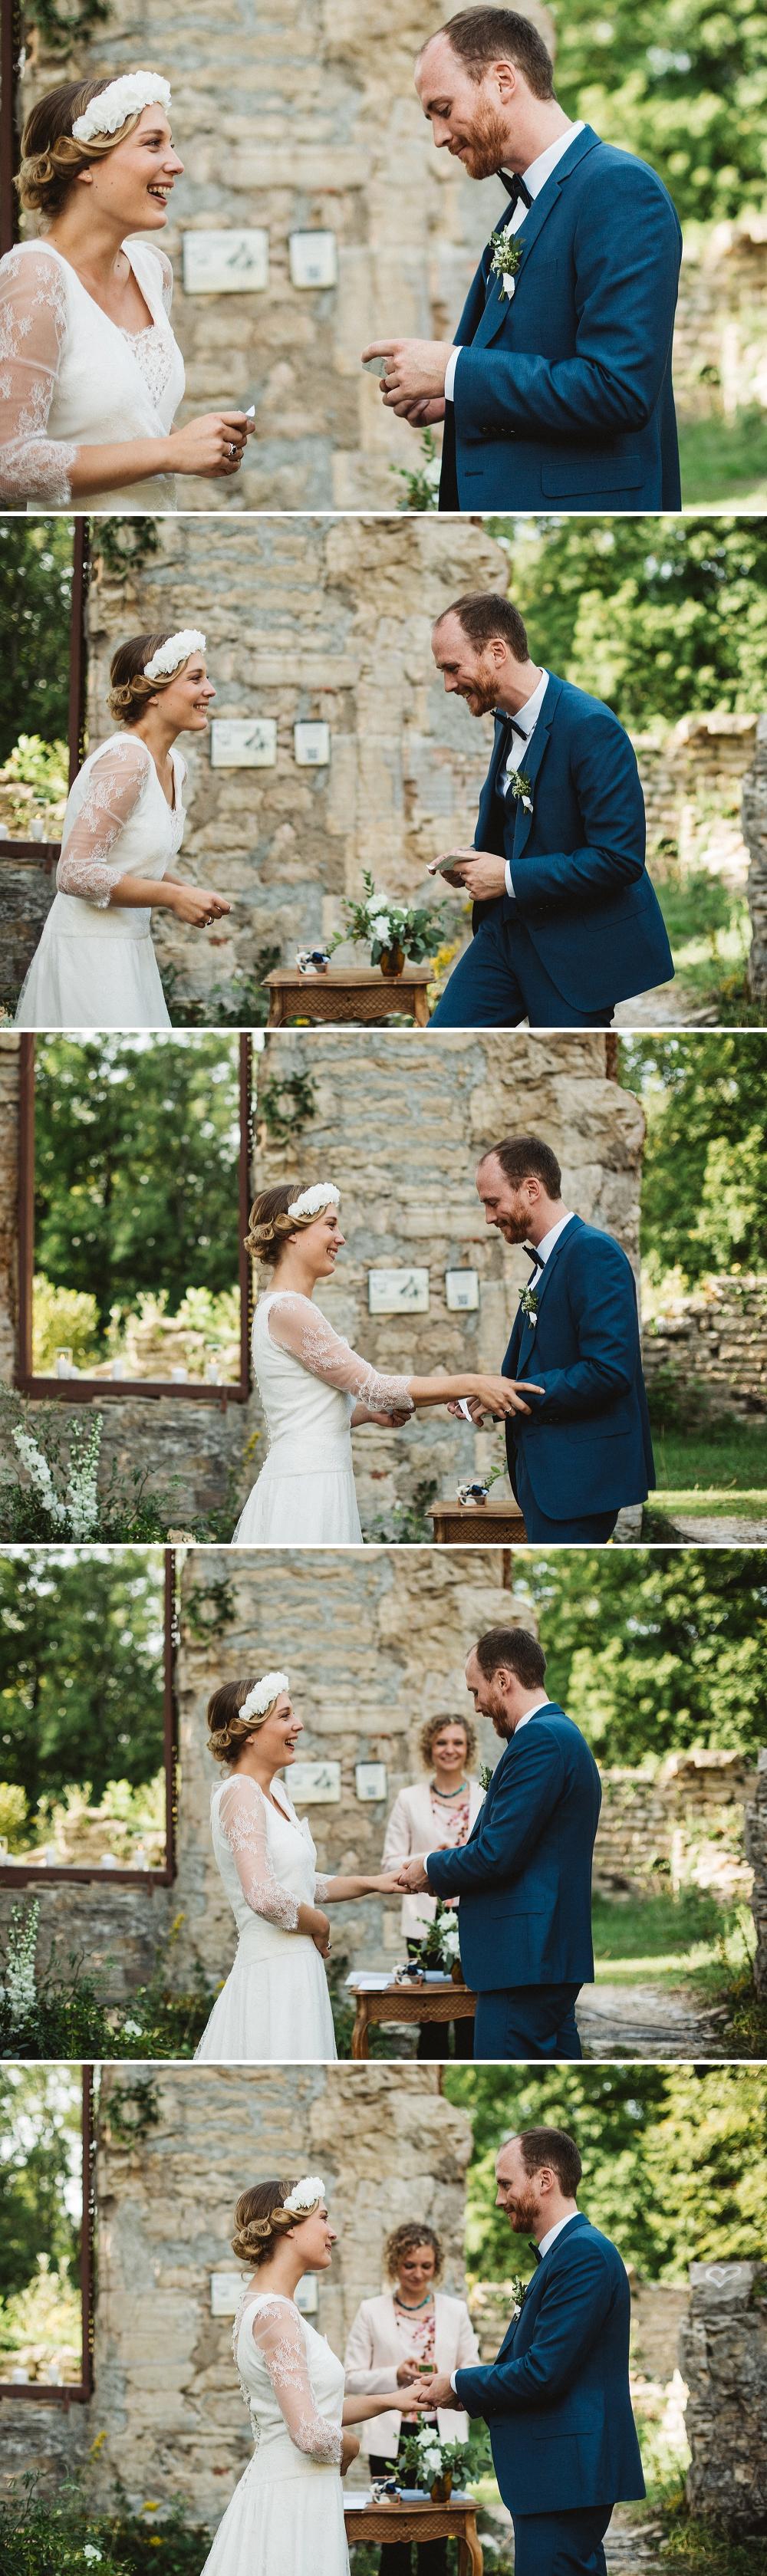 mariage-morimont-18.jpg